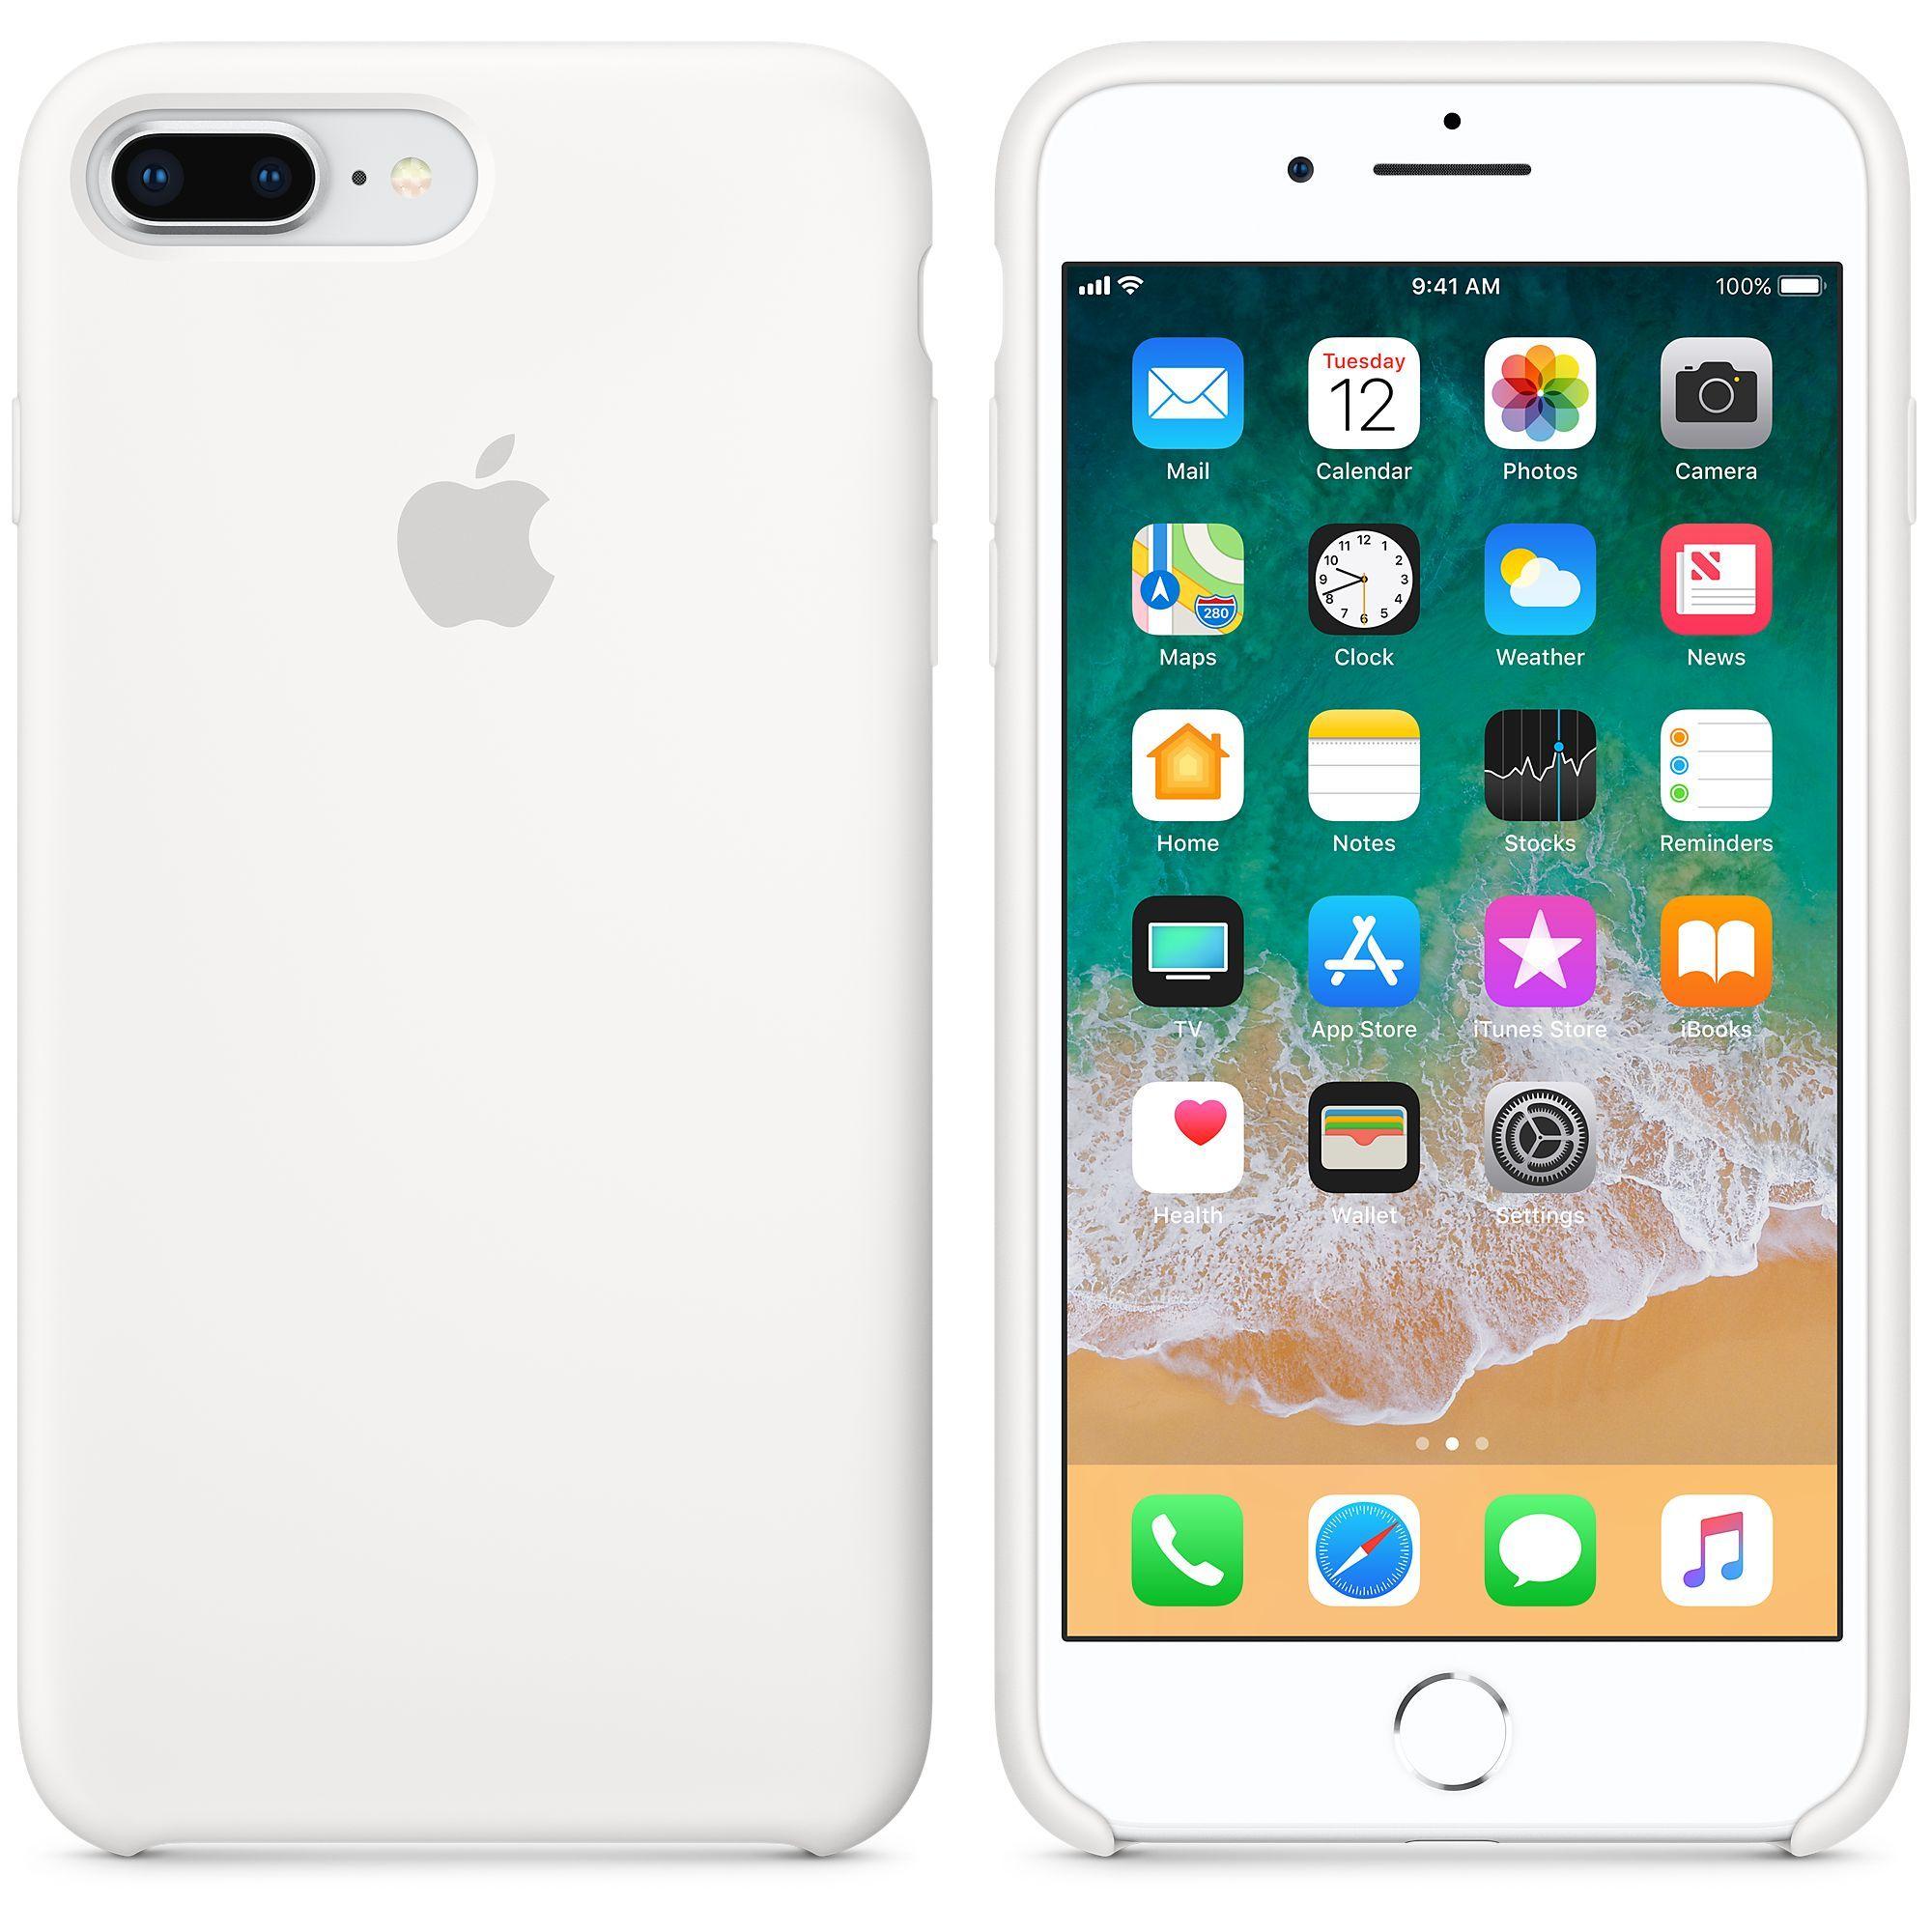 Apple silikónový obal pre iPhone 7 Plus / 8 Plus – biely 3